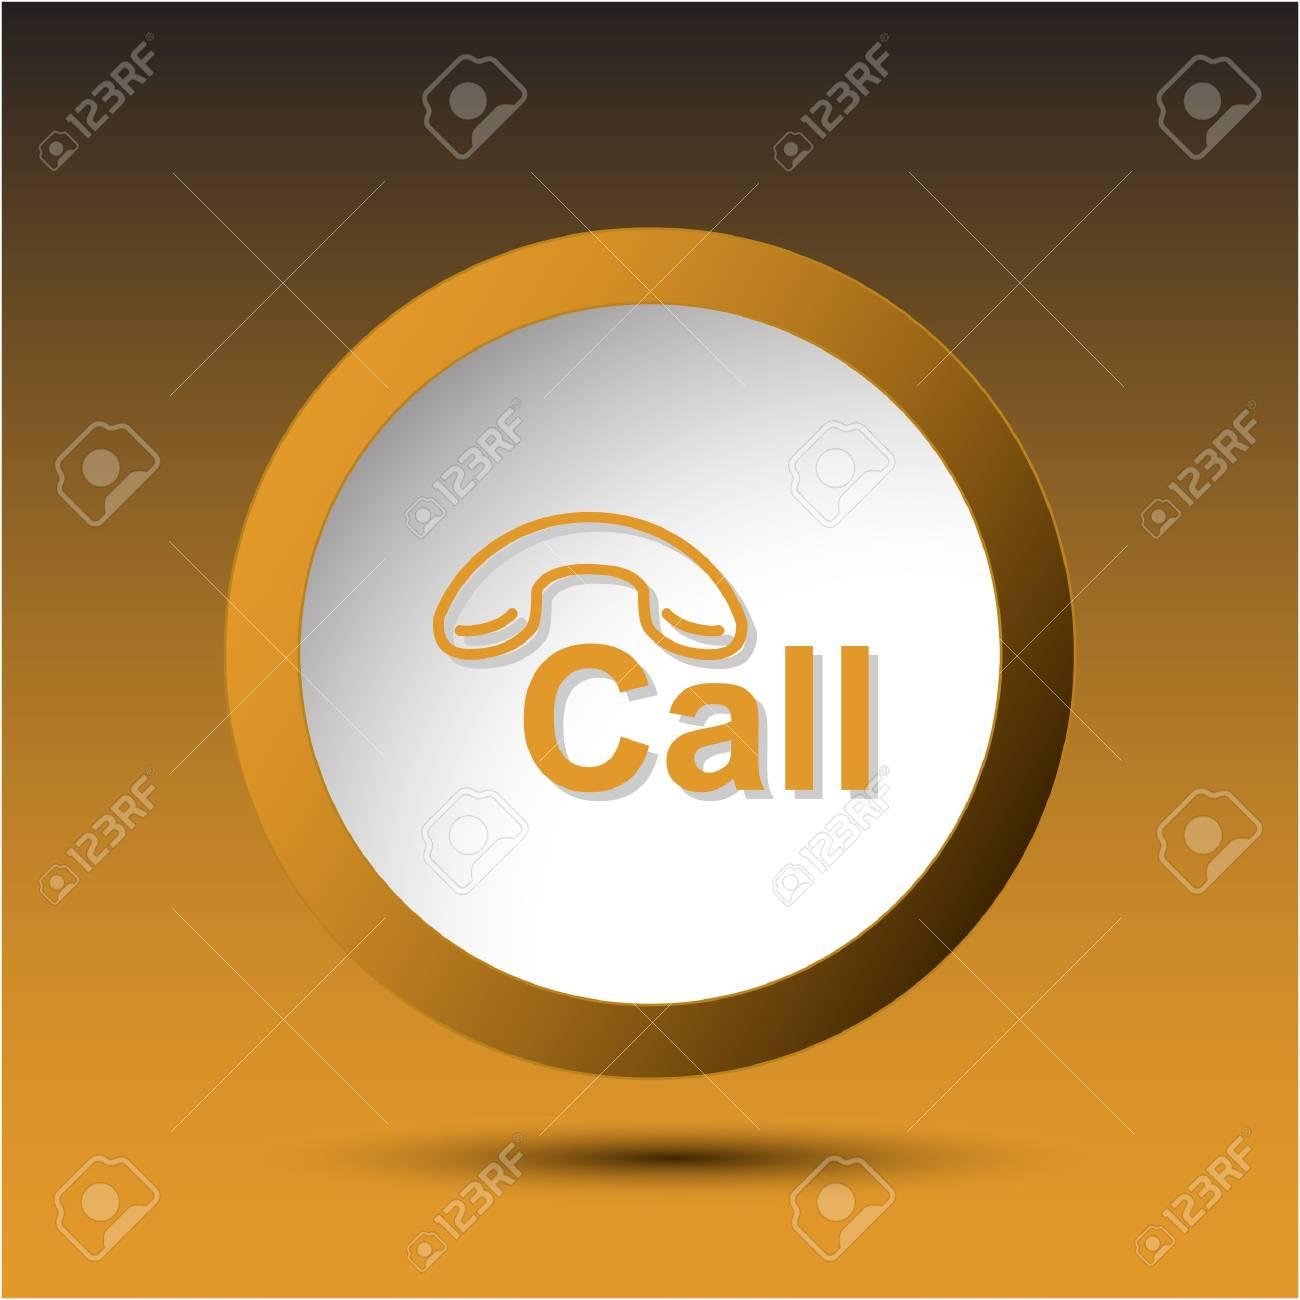 Hotline. Plastic button. Vector illustration. Stock Illustration - 15536884